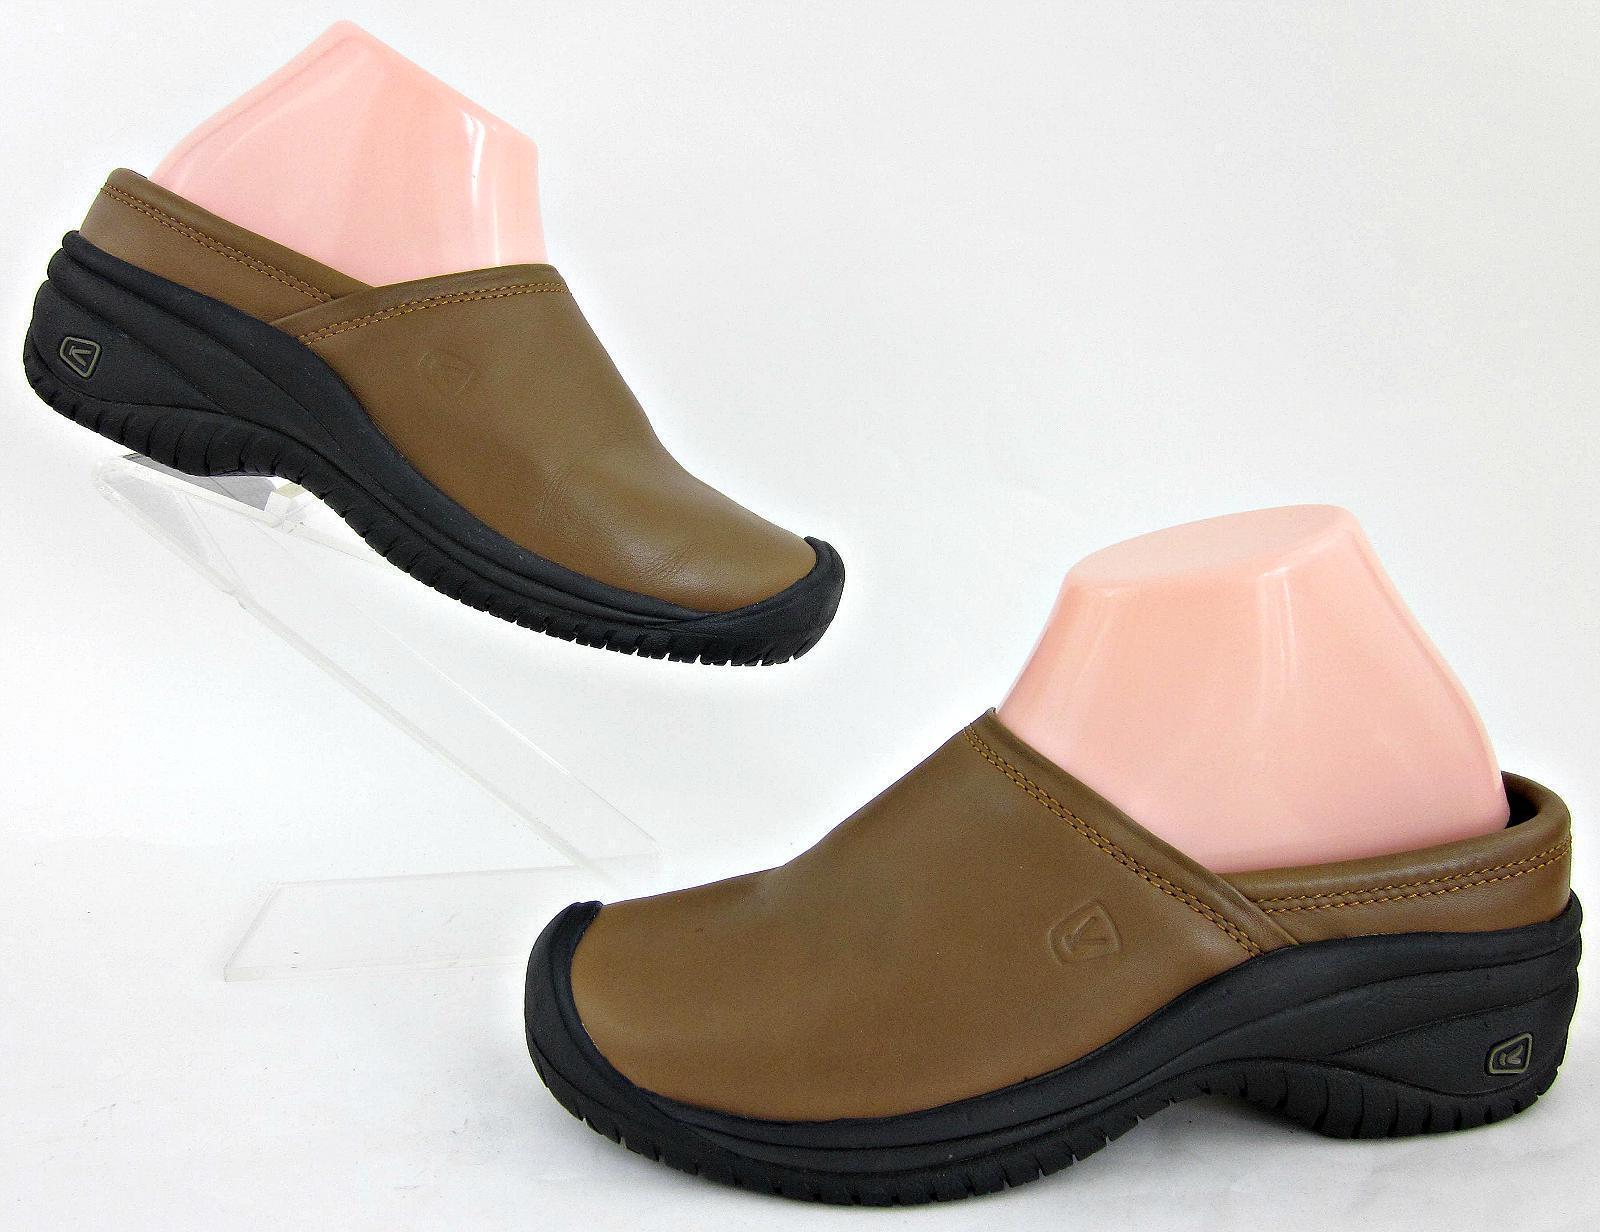 KEEN mujer Utility Work Mule Slides British Tan Sz 8 WORN ONCE